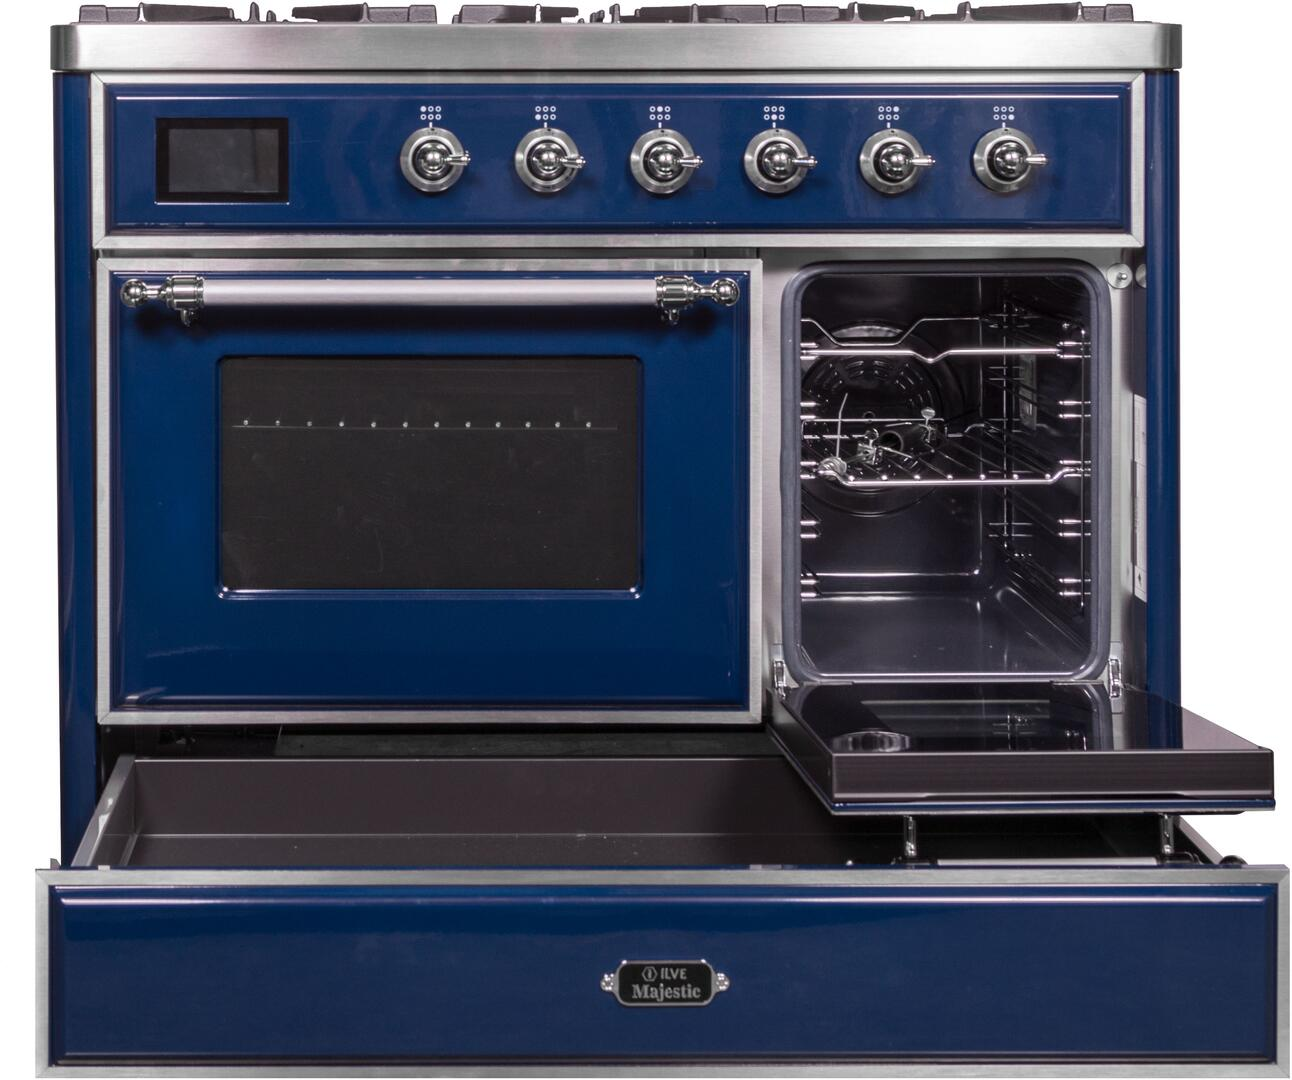 Ilve Majestic II UMD10FDNS3MBC Freestanding Dual Fuel Range Blue, UMD10FDNS3MBC Side Oven Door Opened